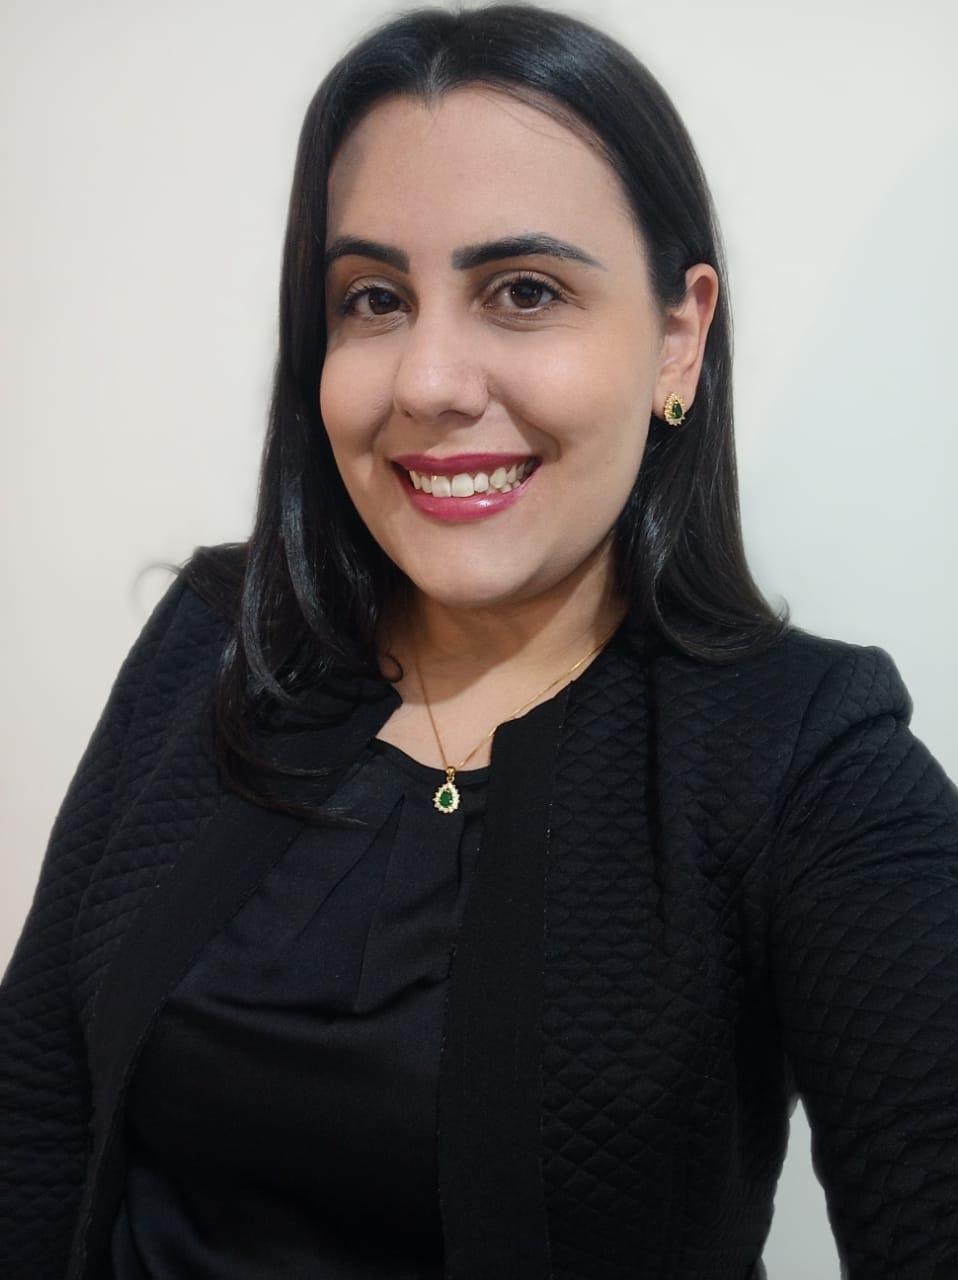 Luisa Vieira Rosado